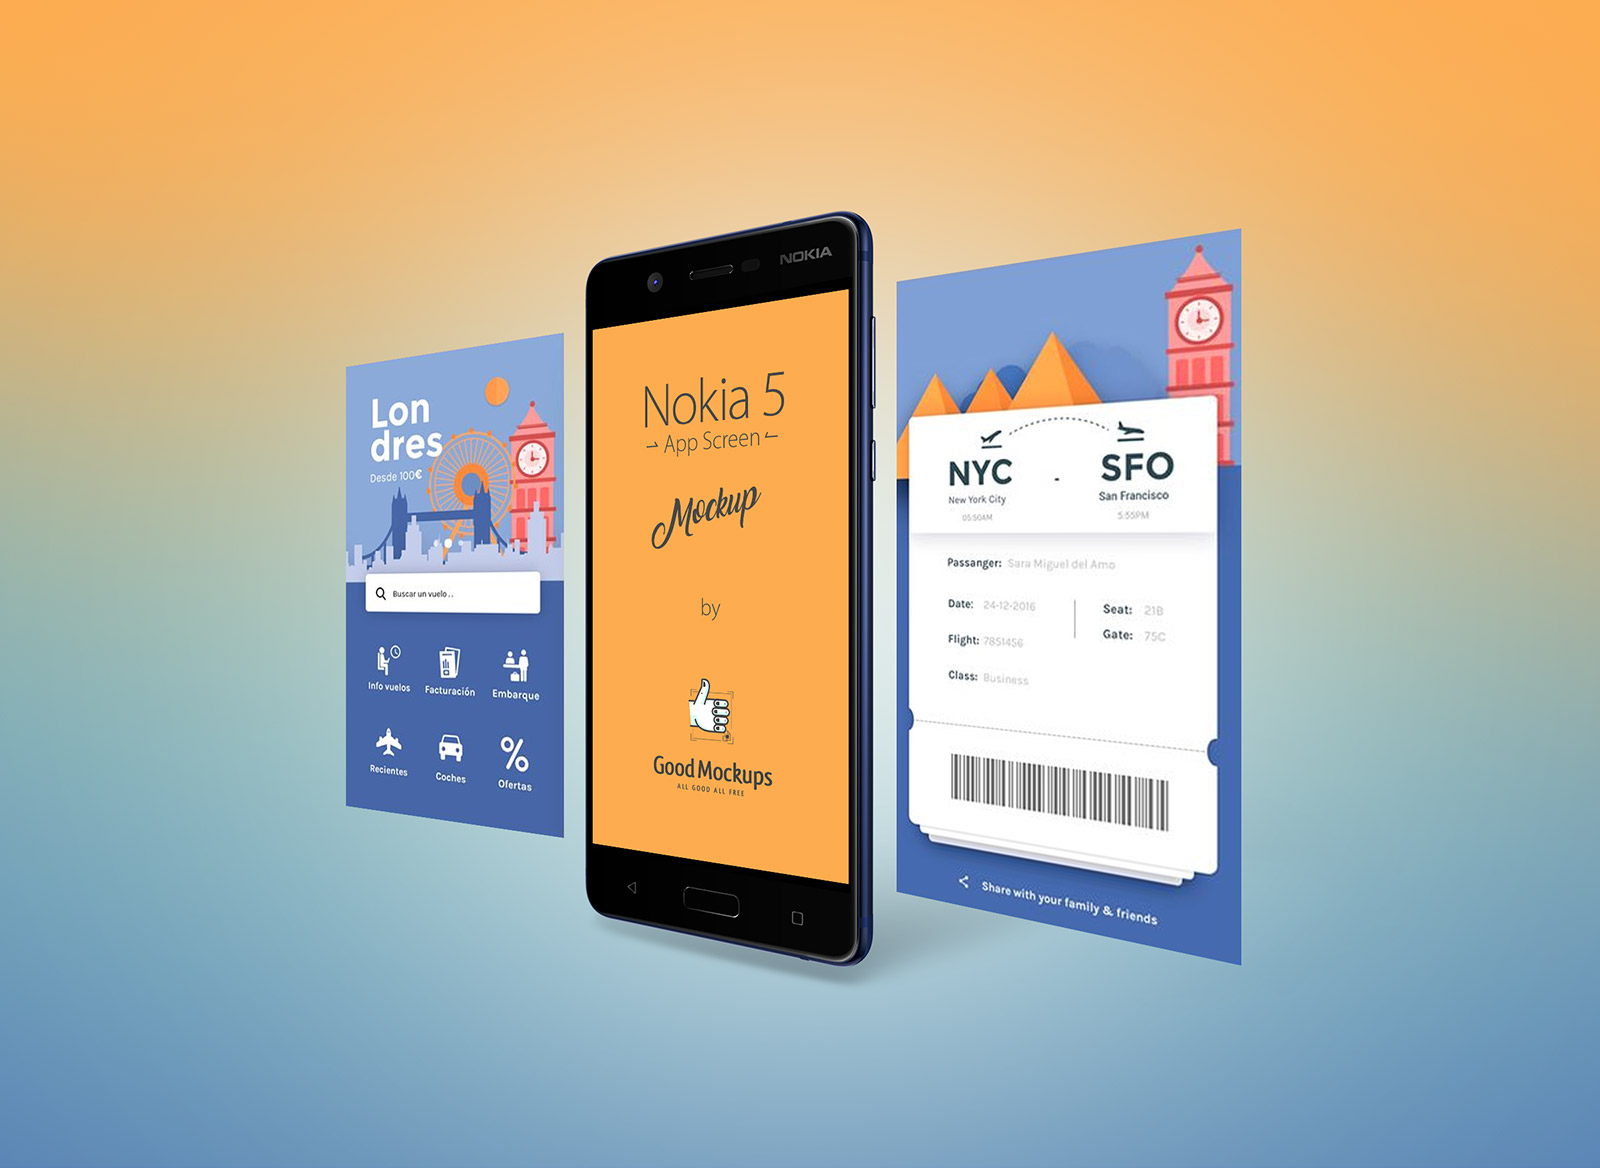 Free-Nokia-5-Smartphone-App-Screen-Mockup-PSD